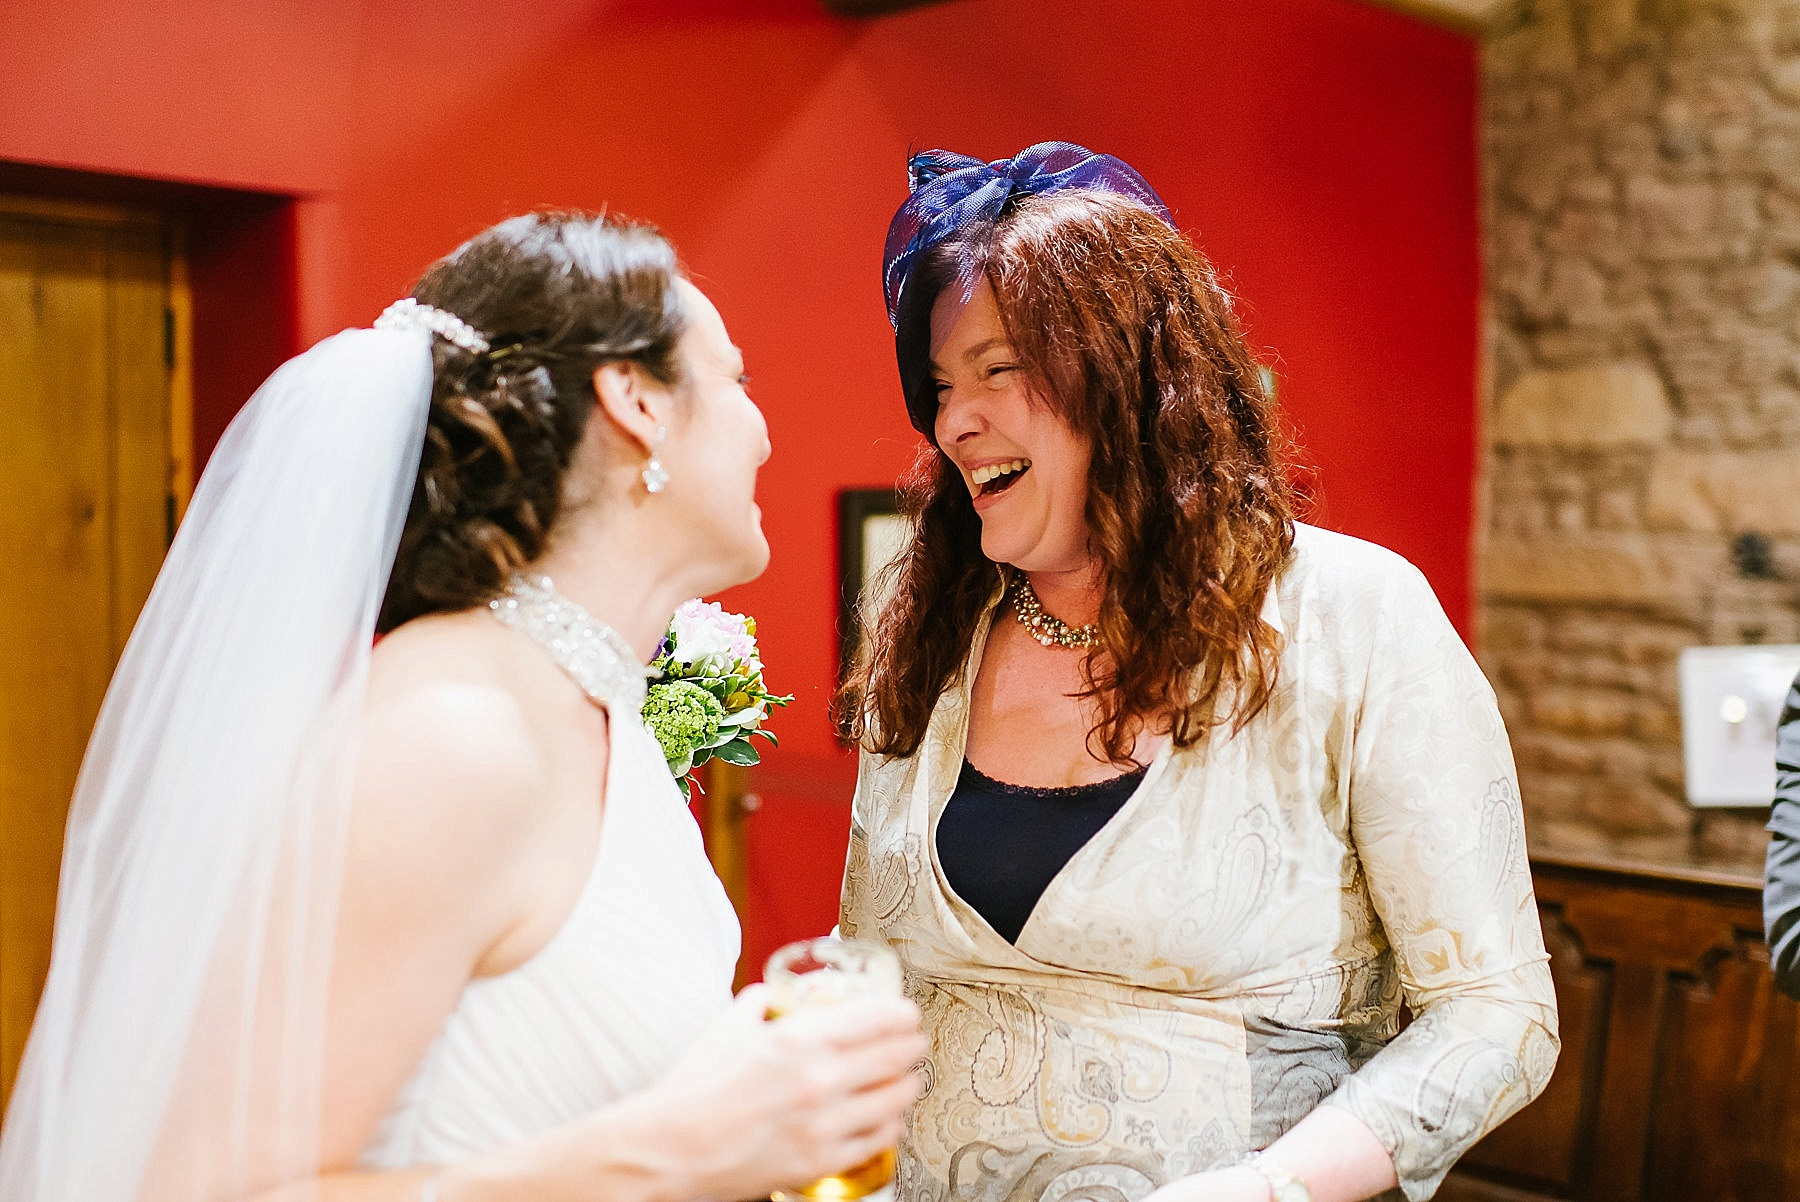 guest having fun with bride